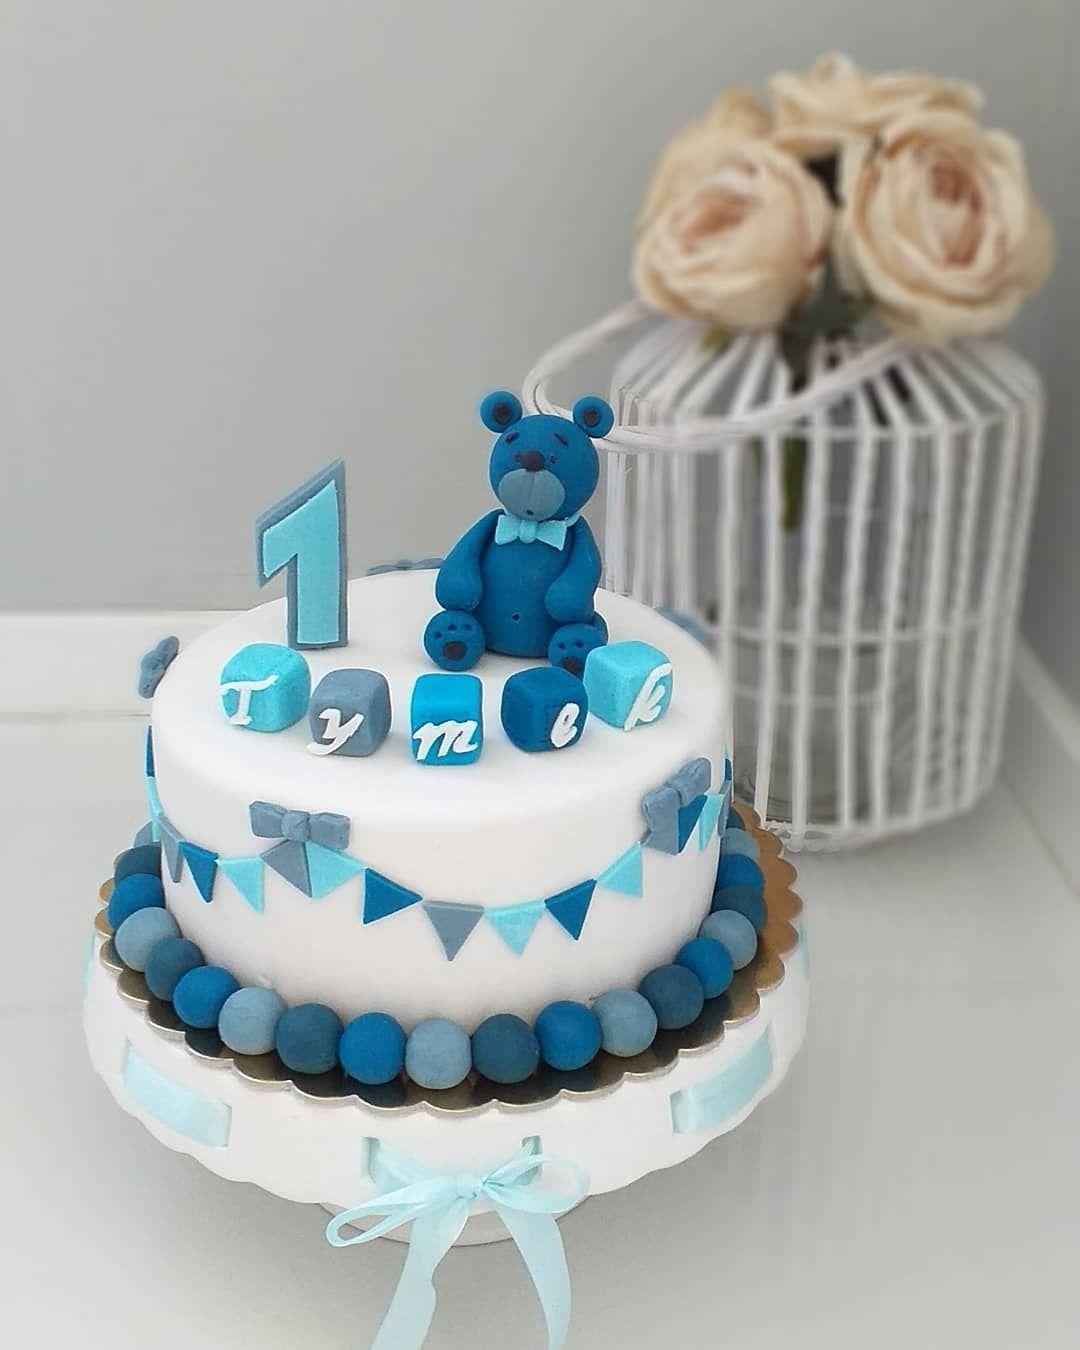 Tort Roczek Tortzmisiem Cake Cakedecor Cakestyle Cakedesign